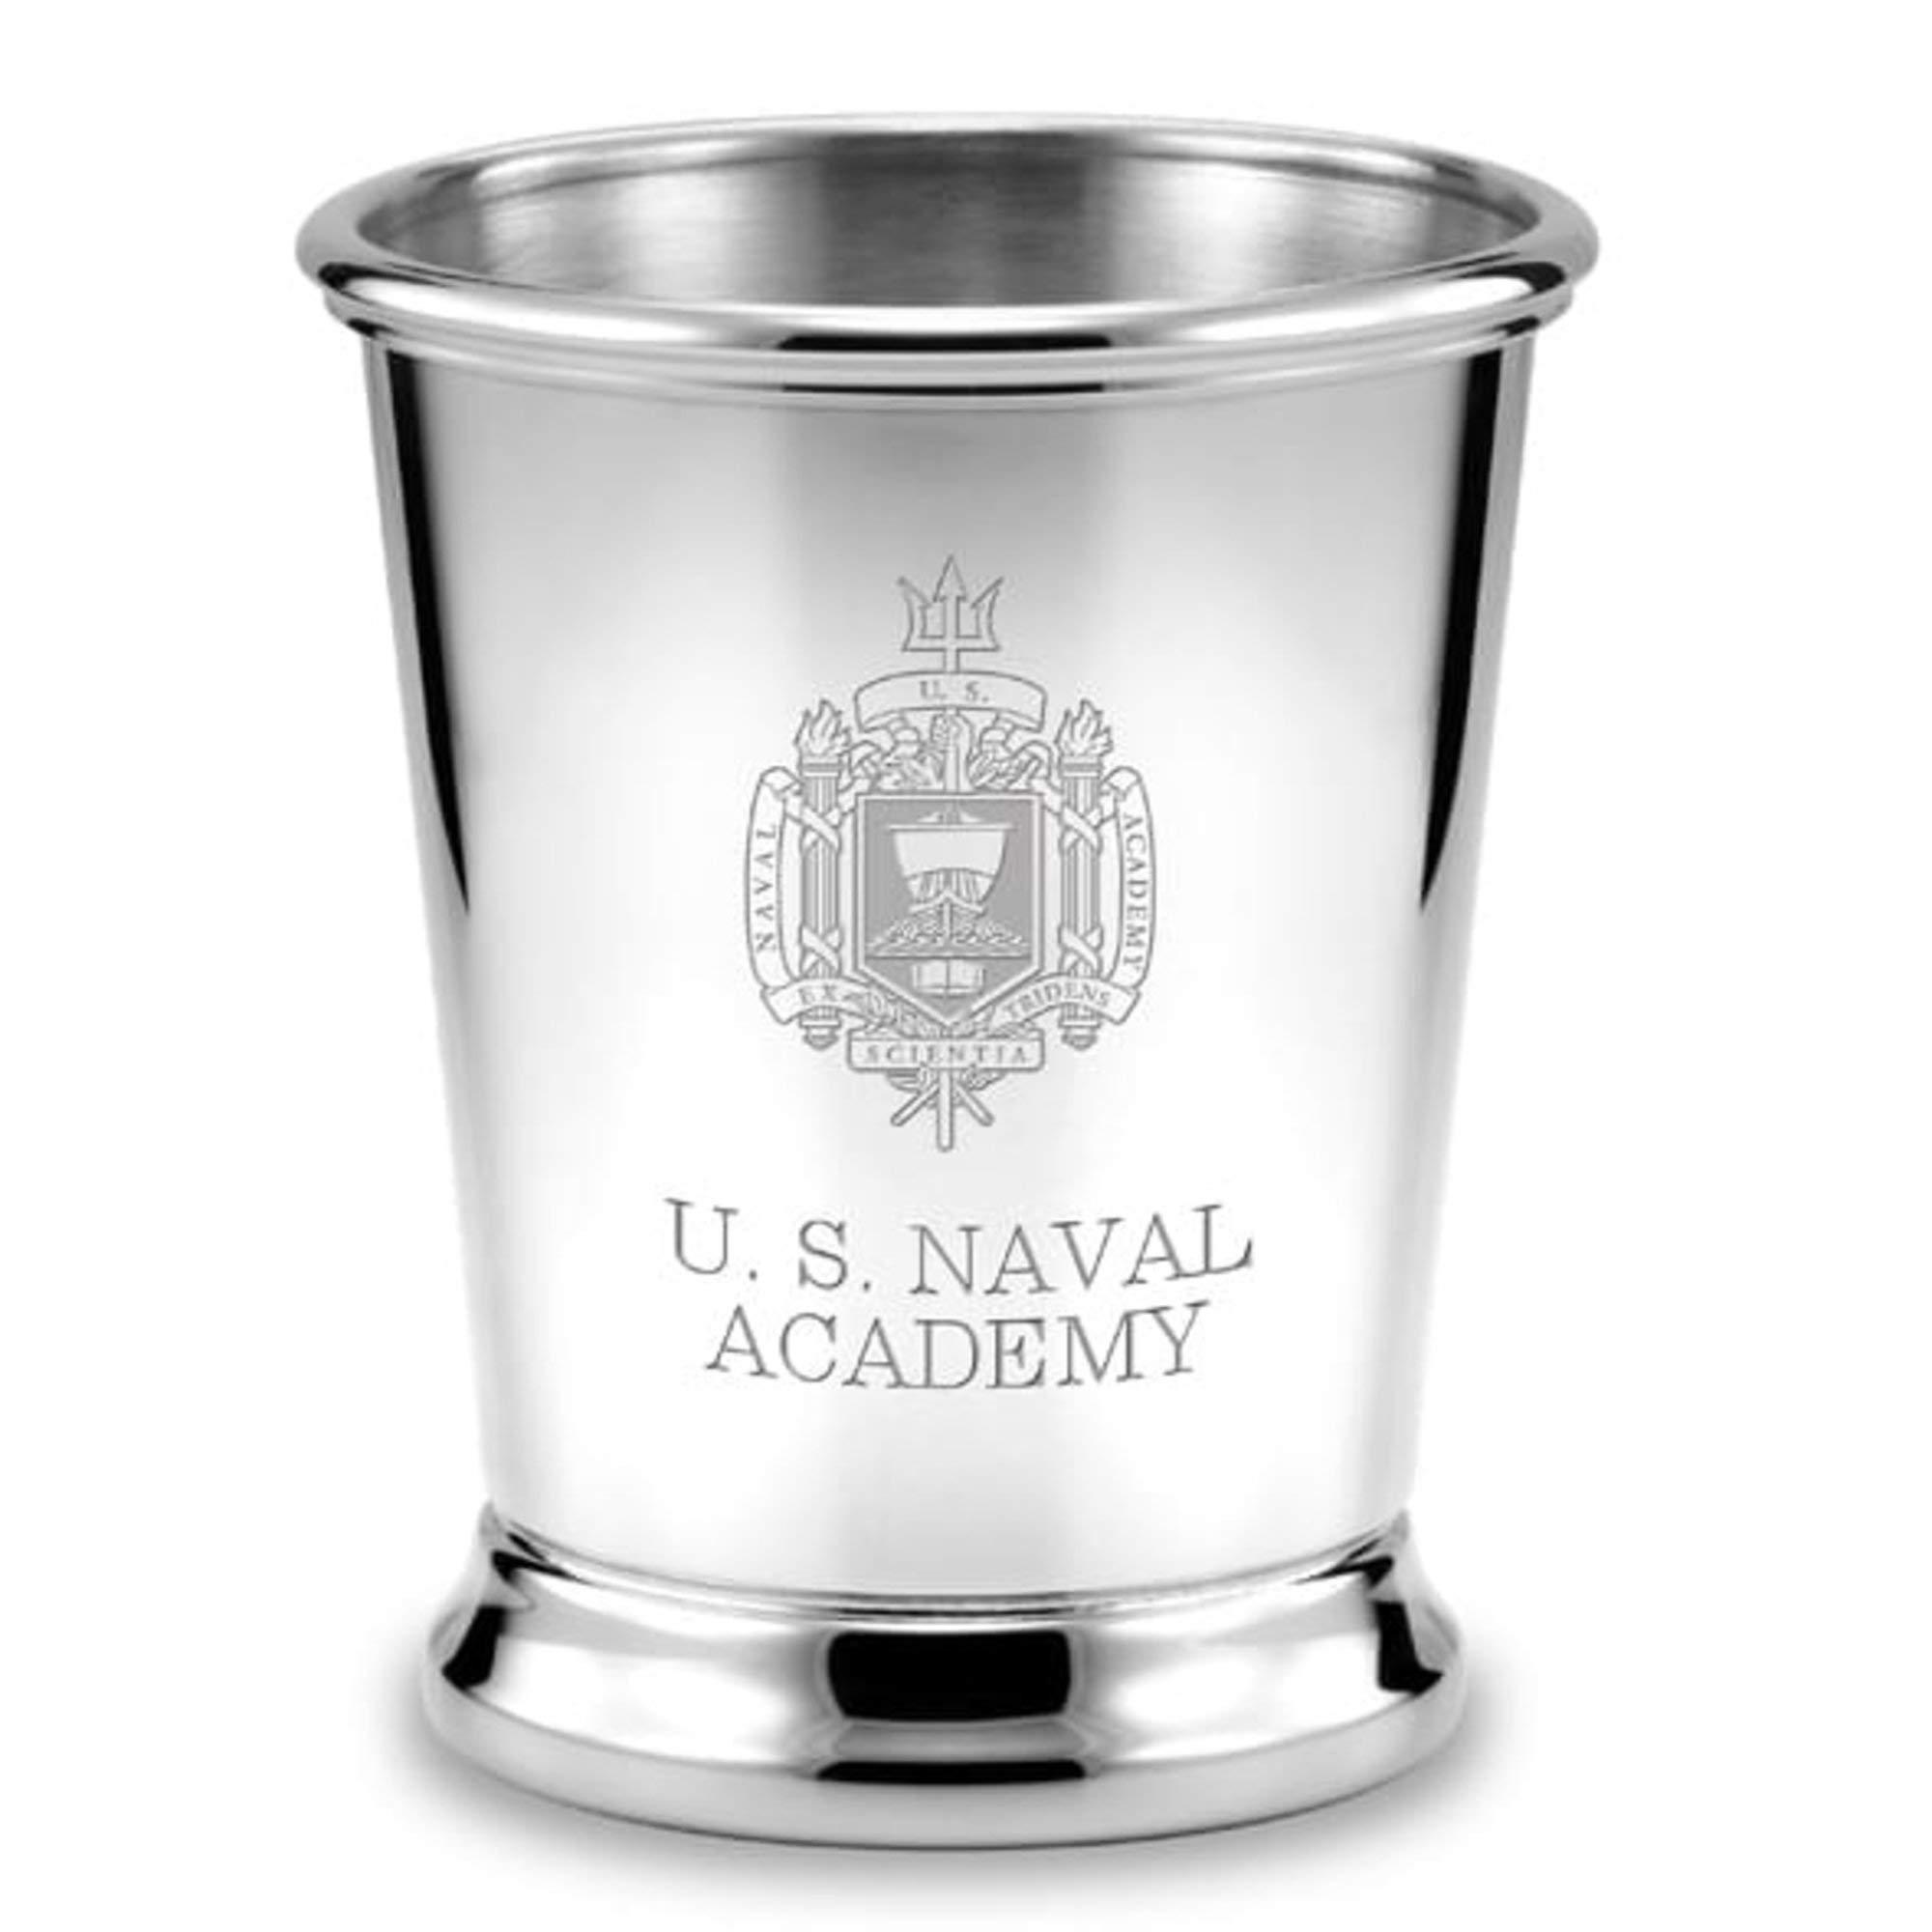 M. LA HART Naval Academy Pewter Julep Cup by M. LA HART (Image #3)